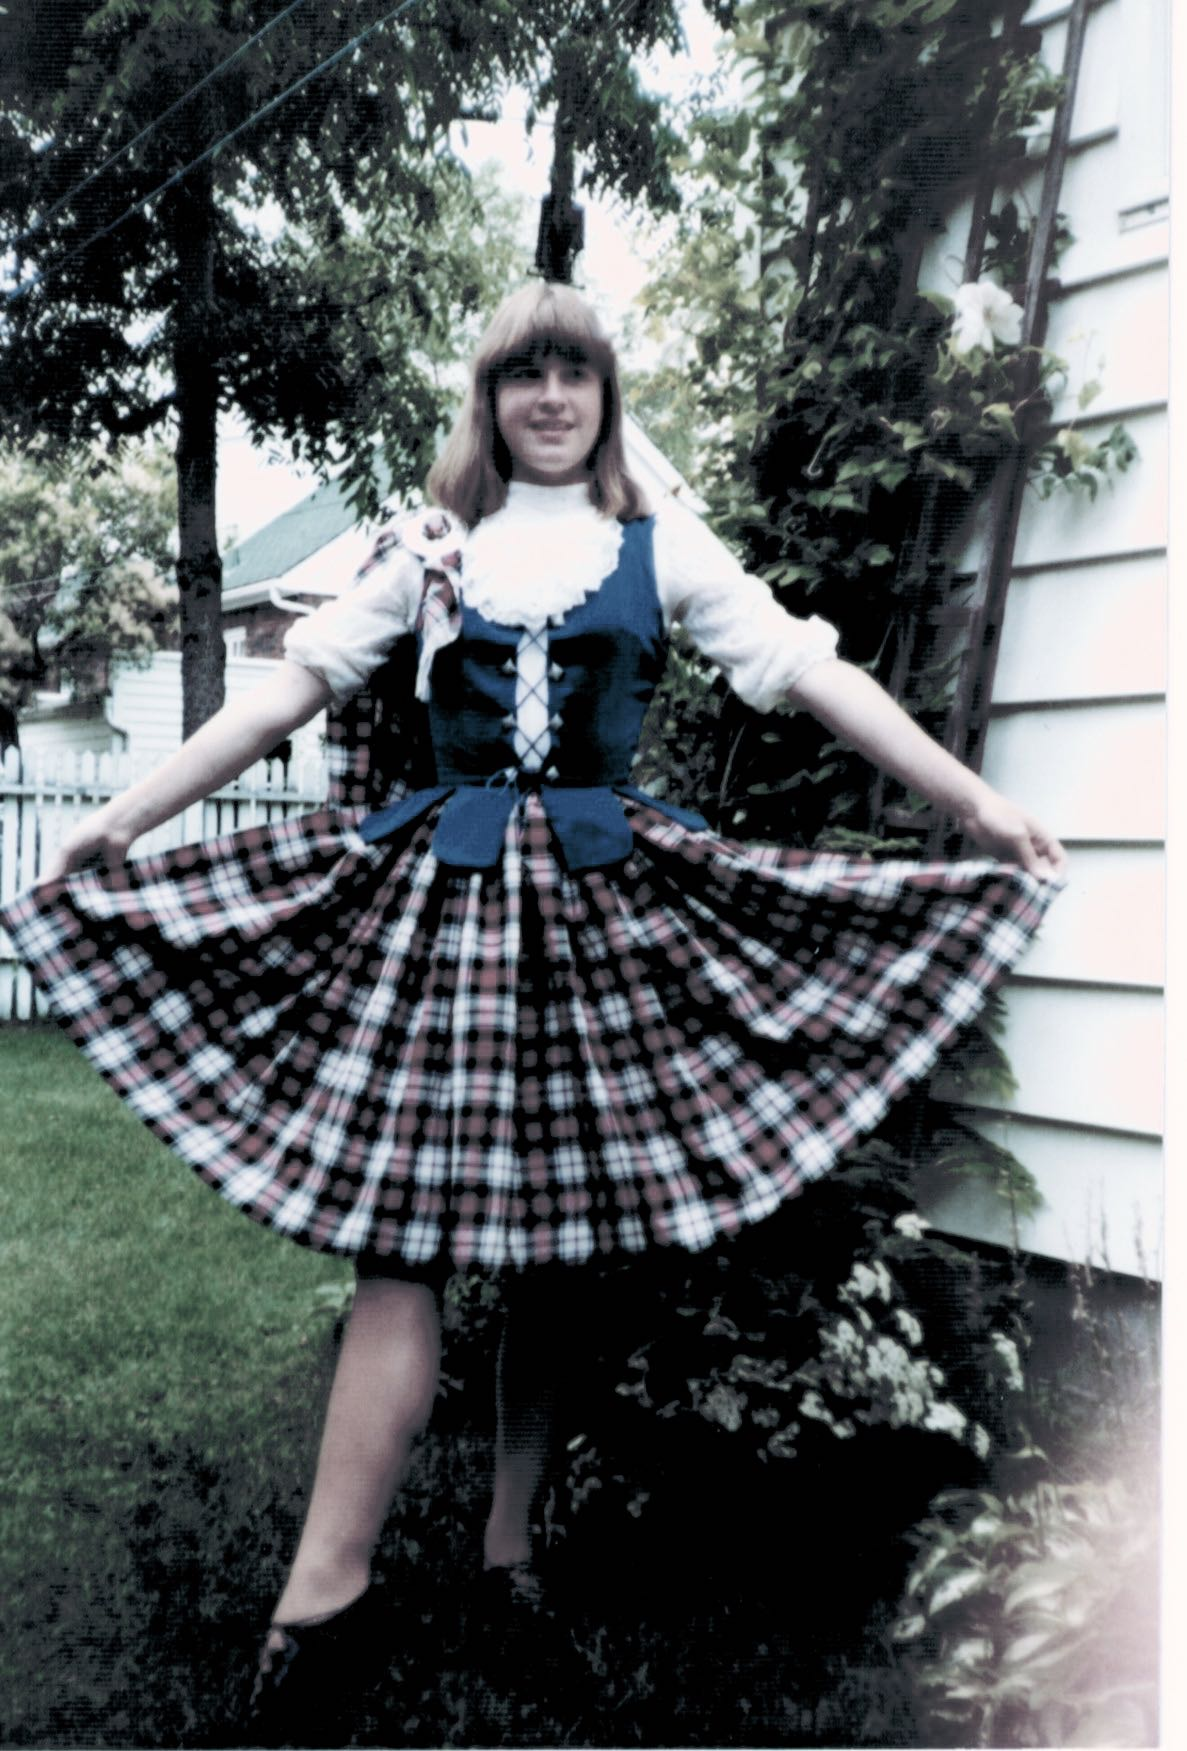 Lana Highland Dancing.jpg